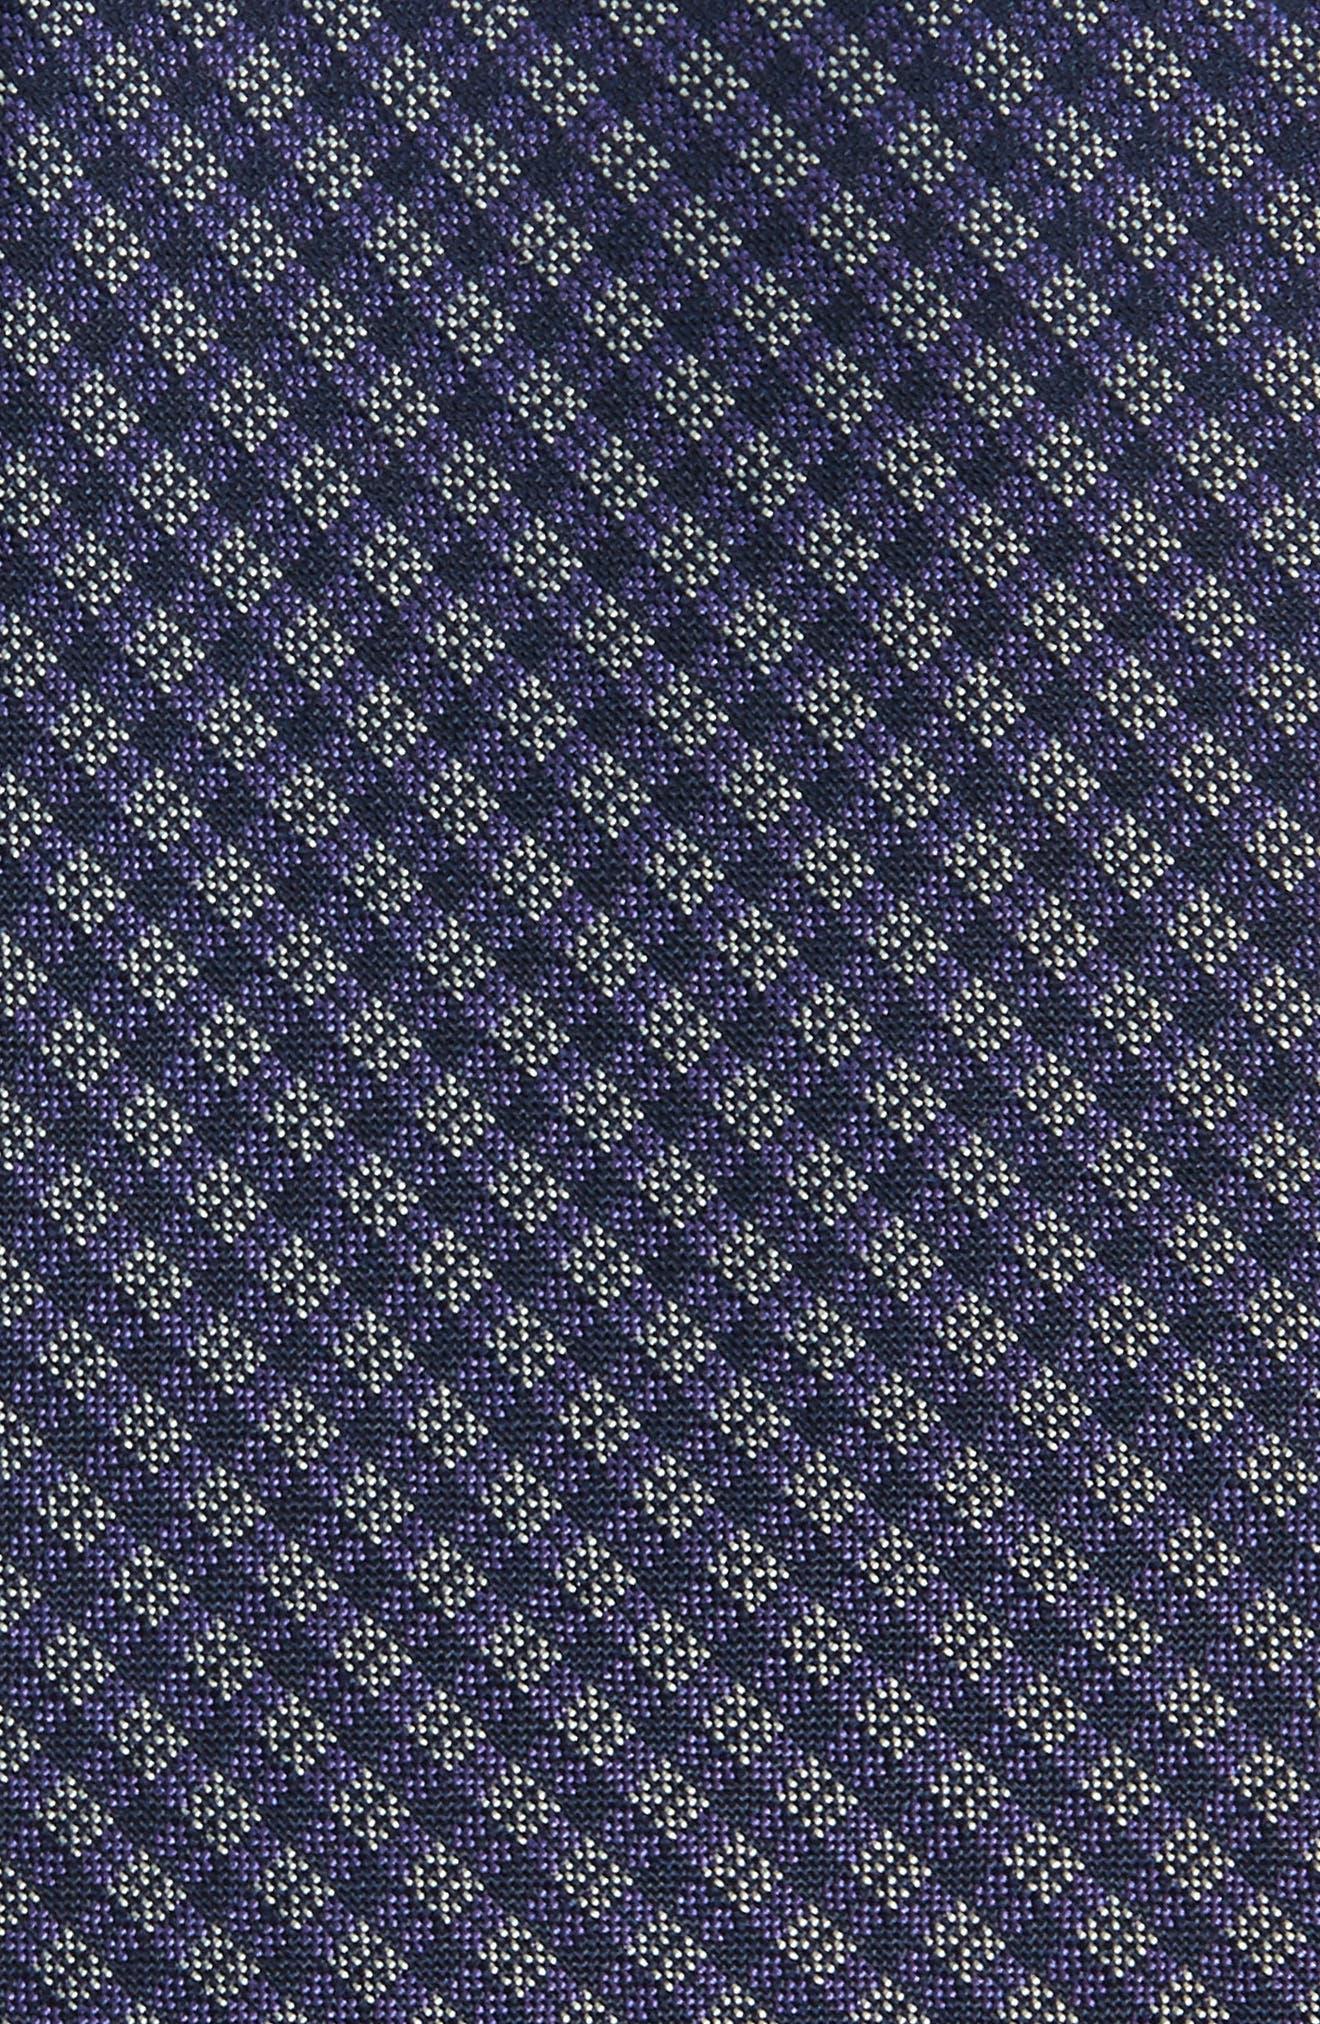 Microcheck Silk Tie,                             Alternate thumbnail 2, color,                             Purple